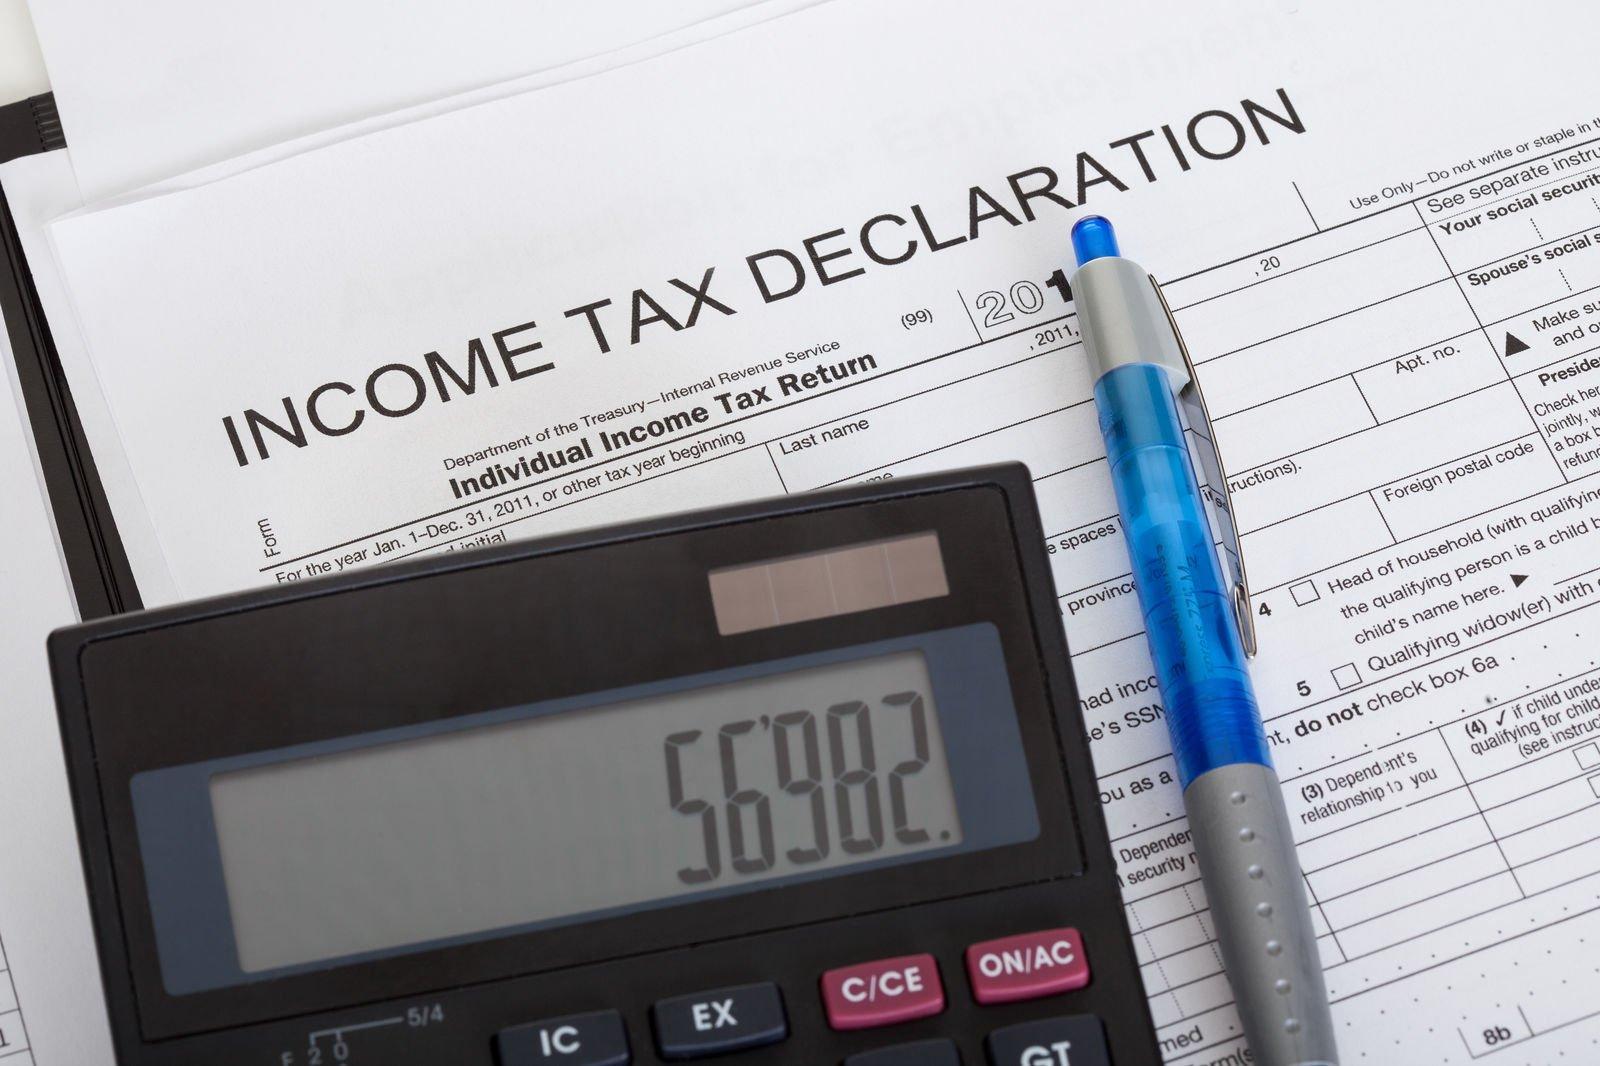 canonprintermx410: 26 New Car Insurance Premium Tax Deduction